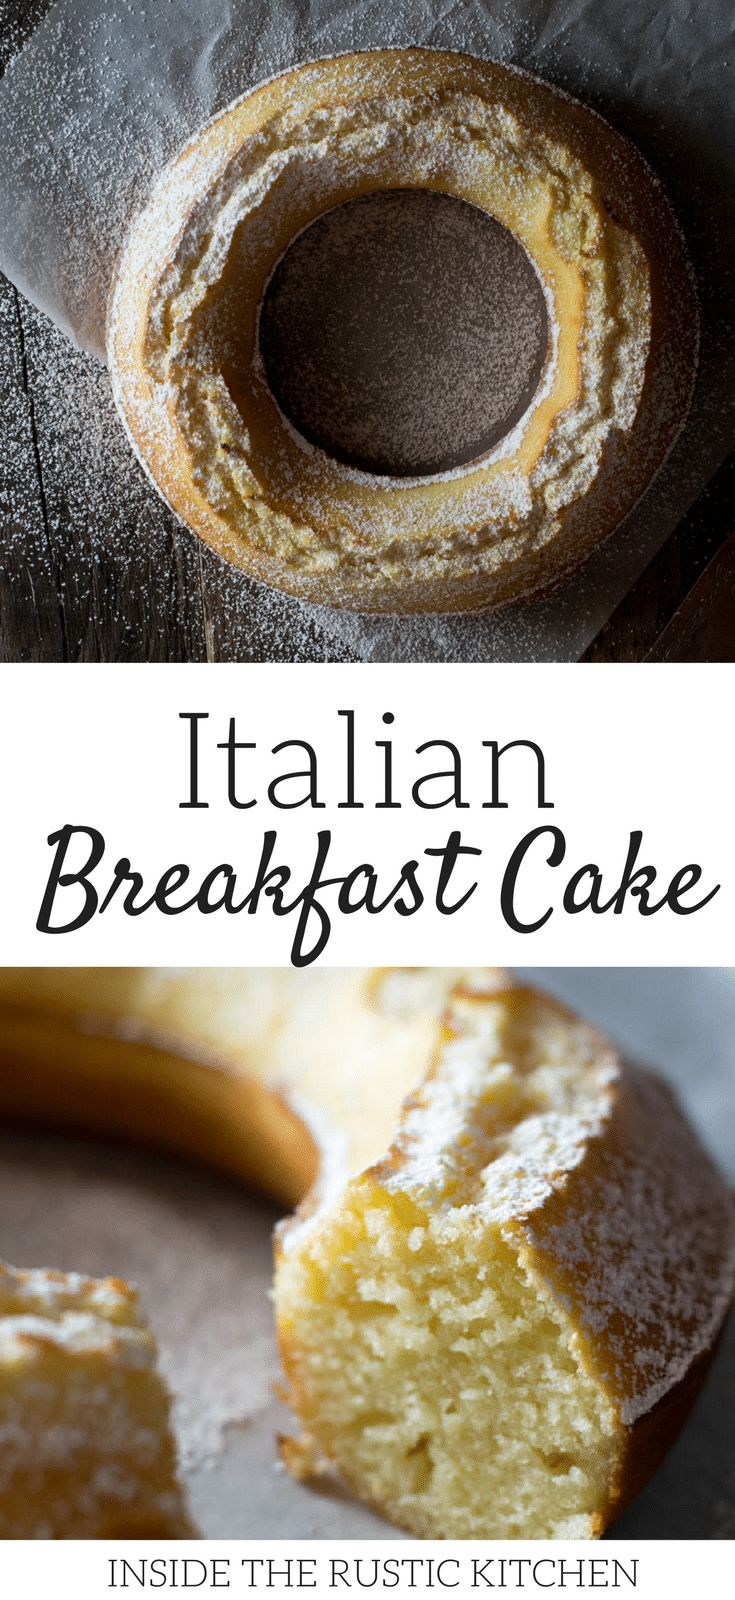 An Italian breakfast cake recipe - Italian ciambella recipe made with flour, eggs, sugar, lemon zest and yogurt. Made in under 30 minutes. An easy authentic Italian breakfast recipe. For more authentic Italian recipes visit Insidetherustickitchen.com via @InsideTRK